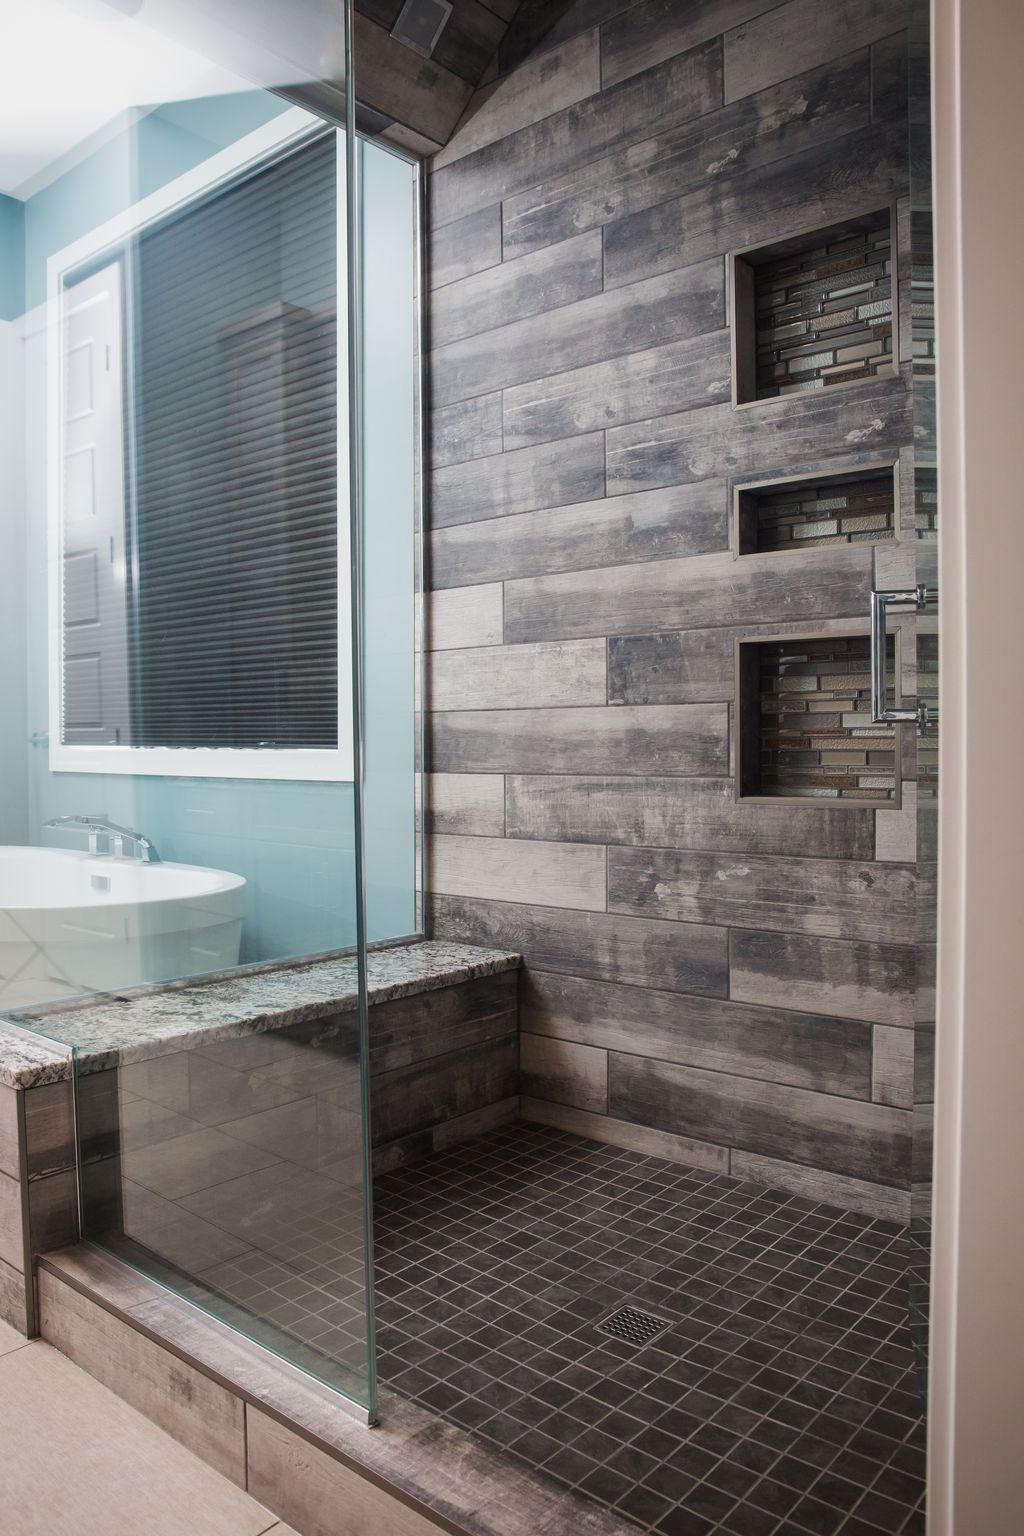 99+ inspiring bathroom tile design 2017 ideas (90 ...